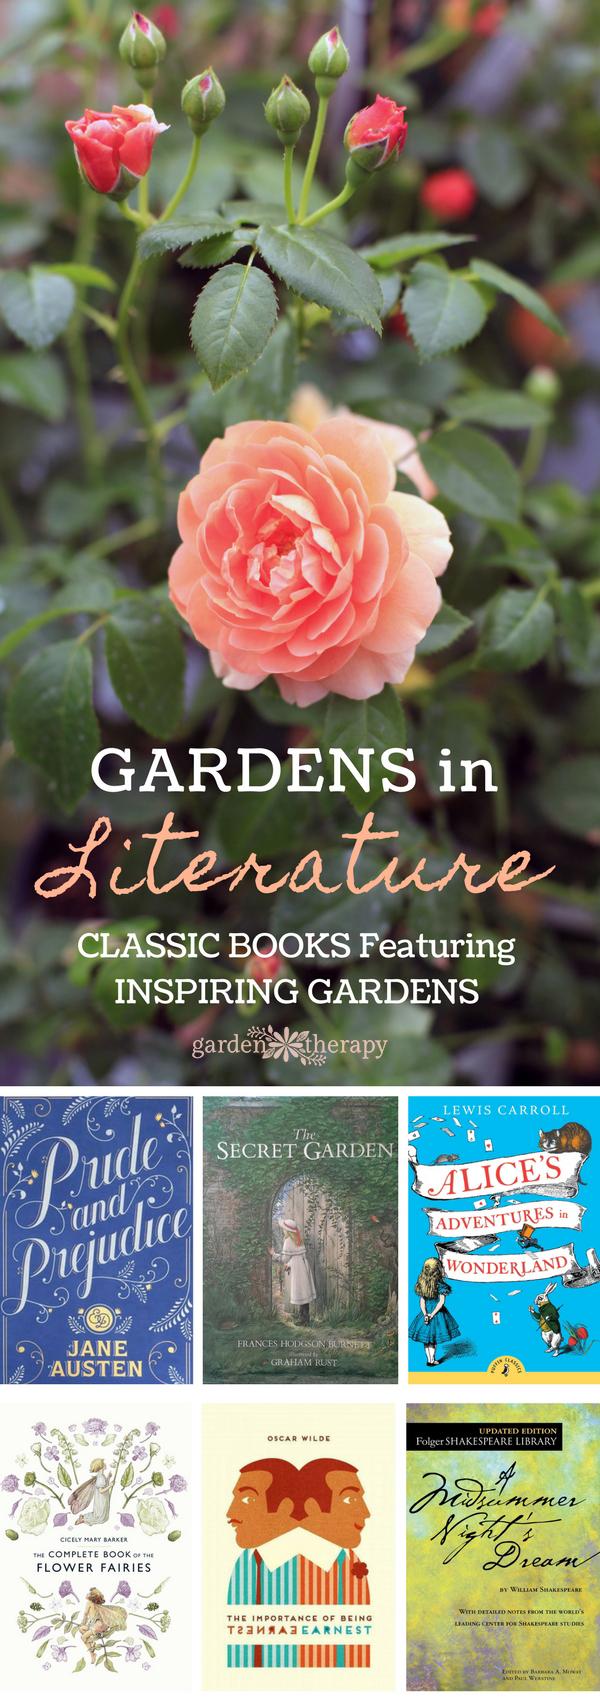 classic books featuring inspiring gardens